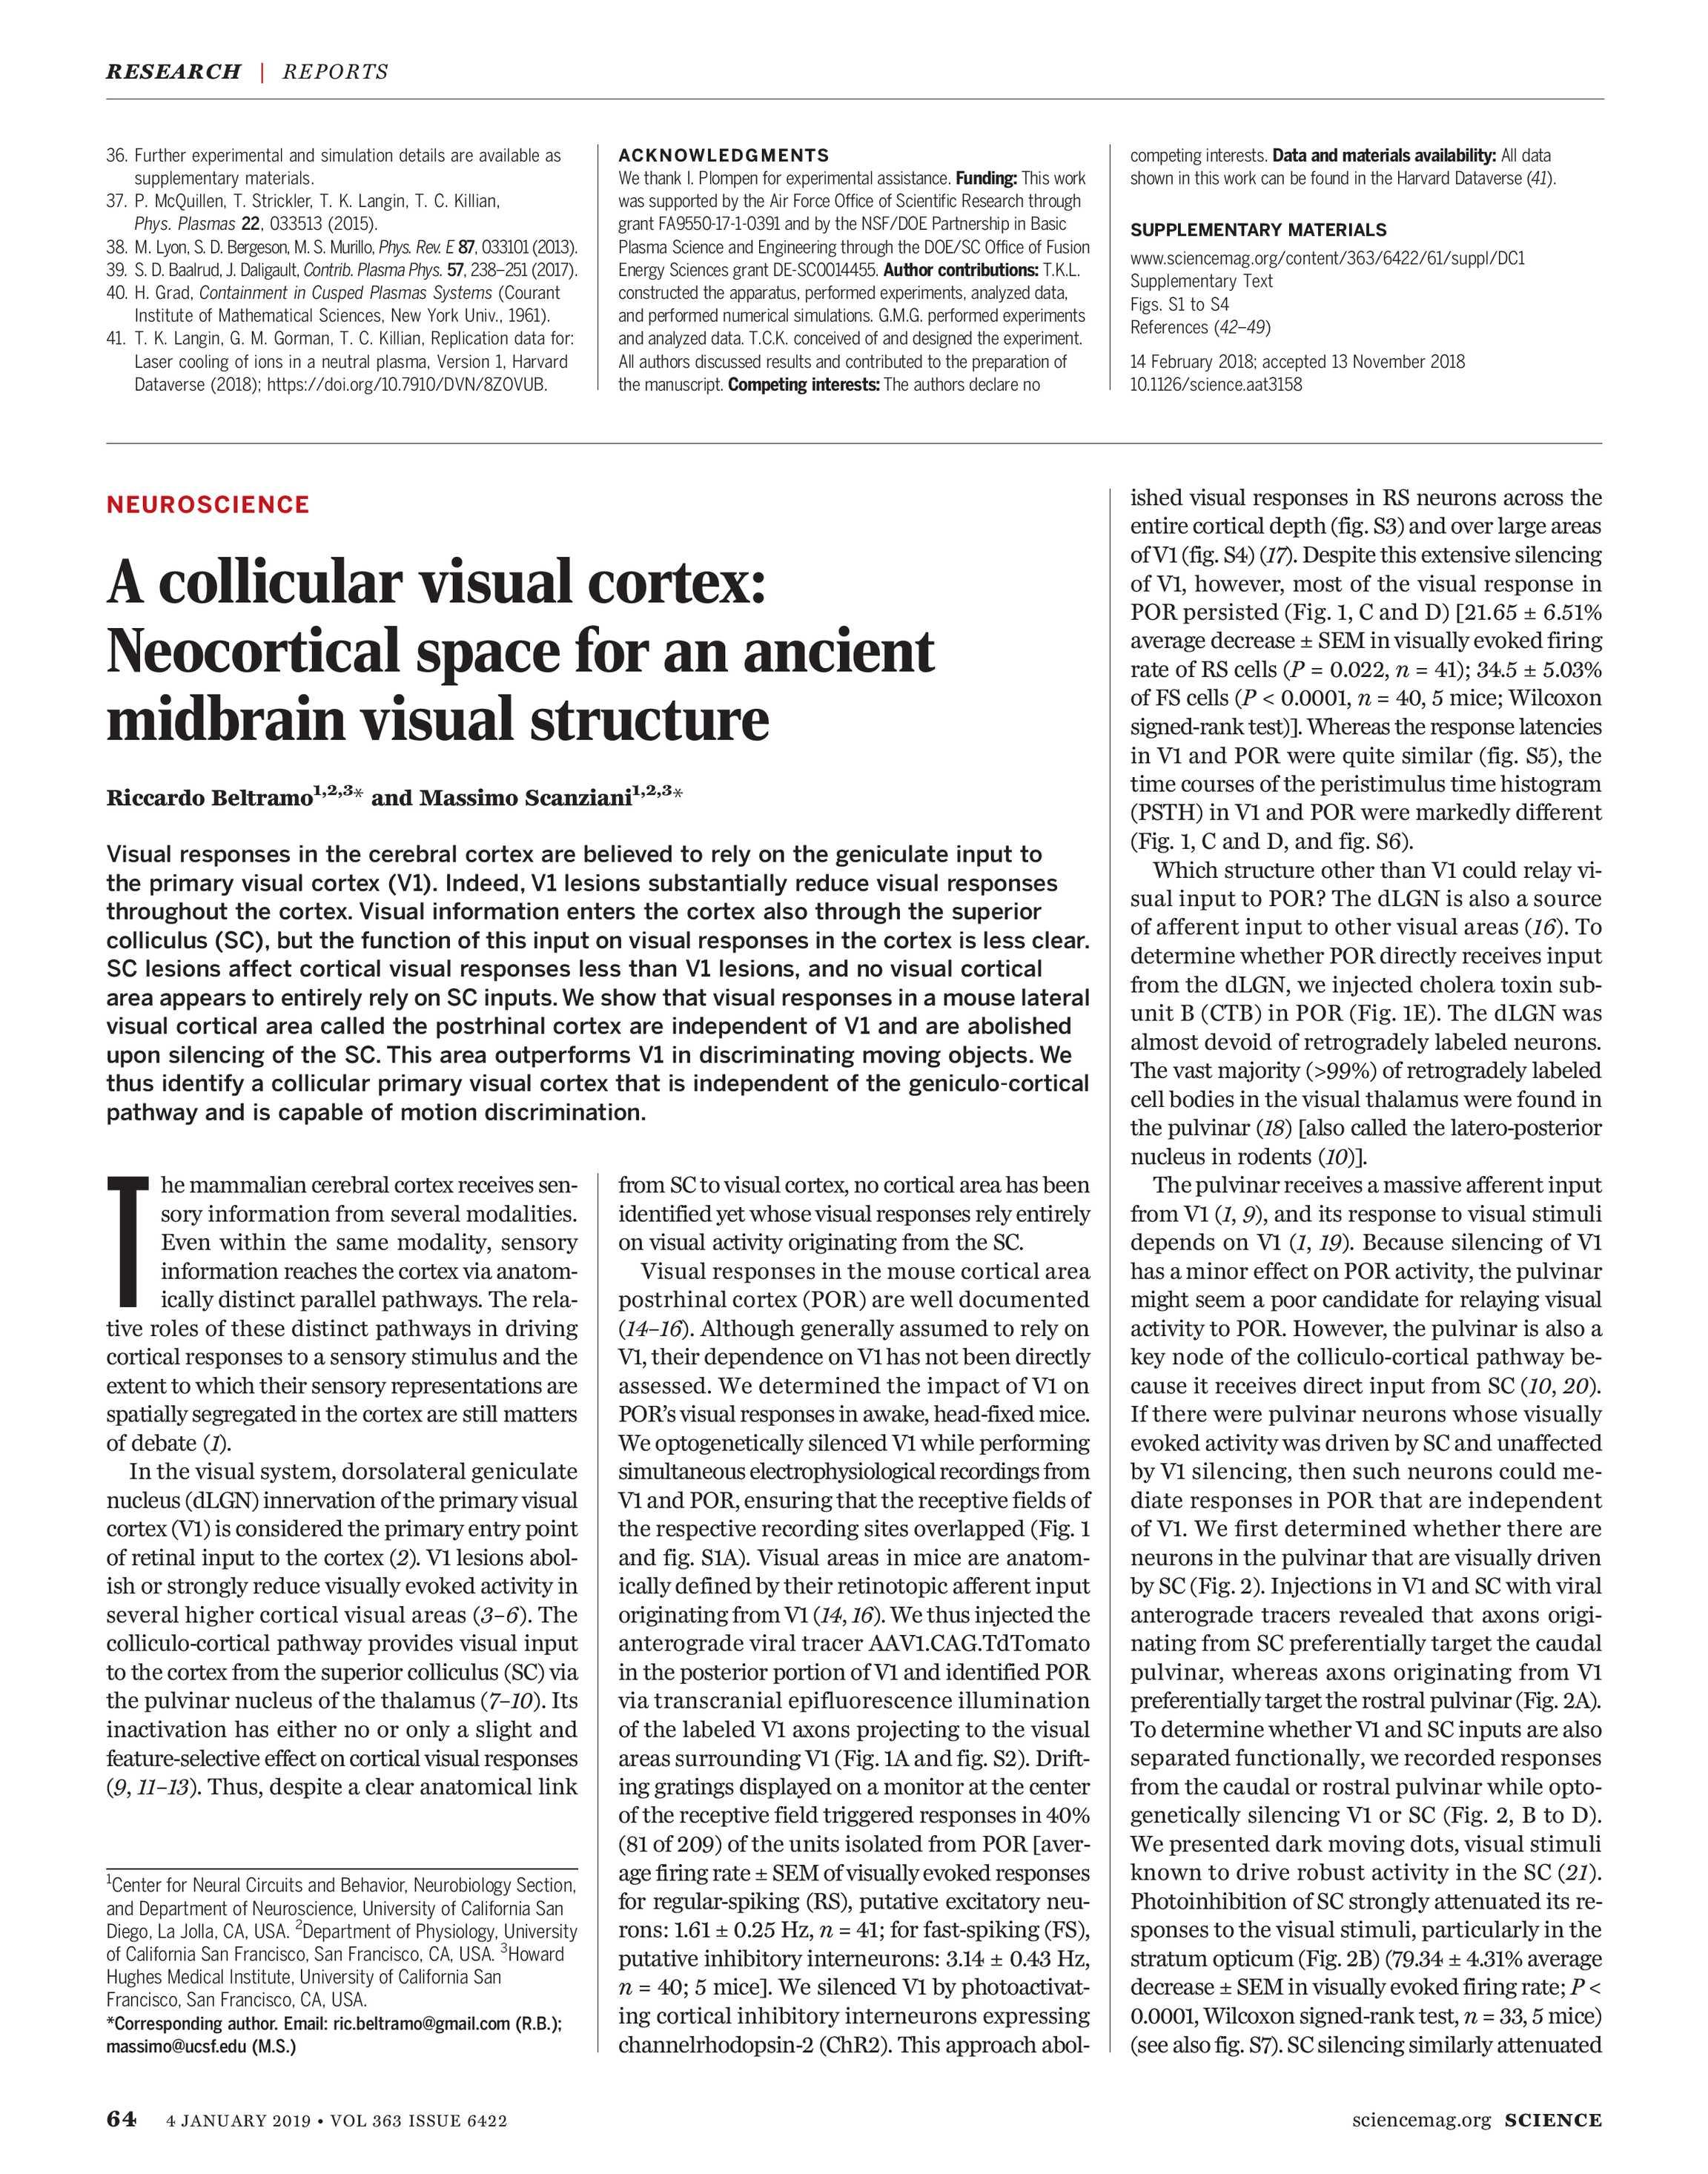 Science Magazine - January 4, 2019 - page 64